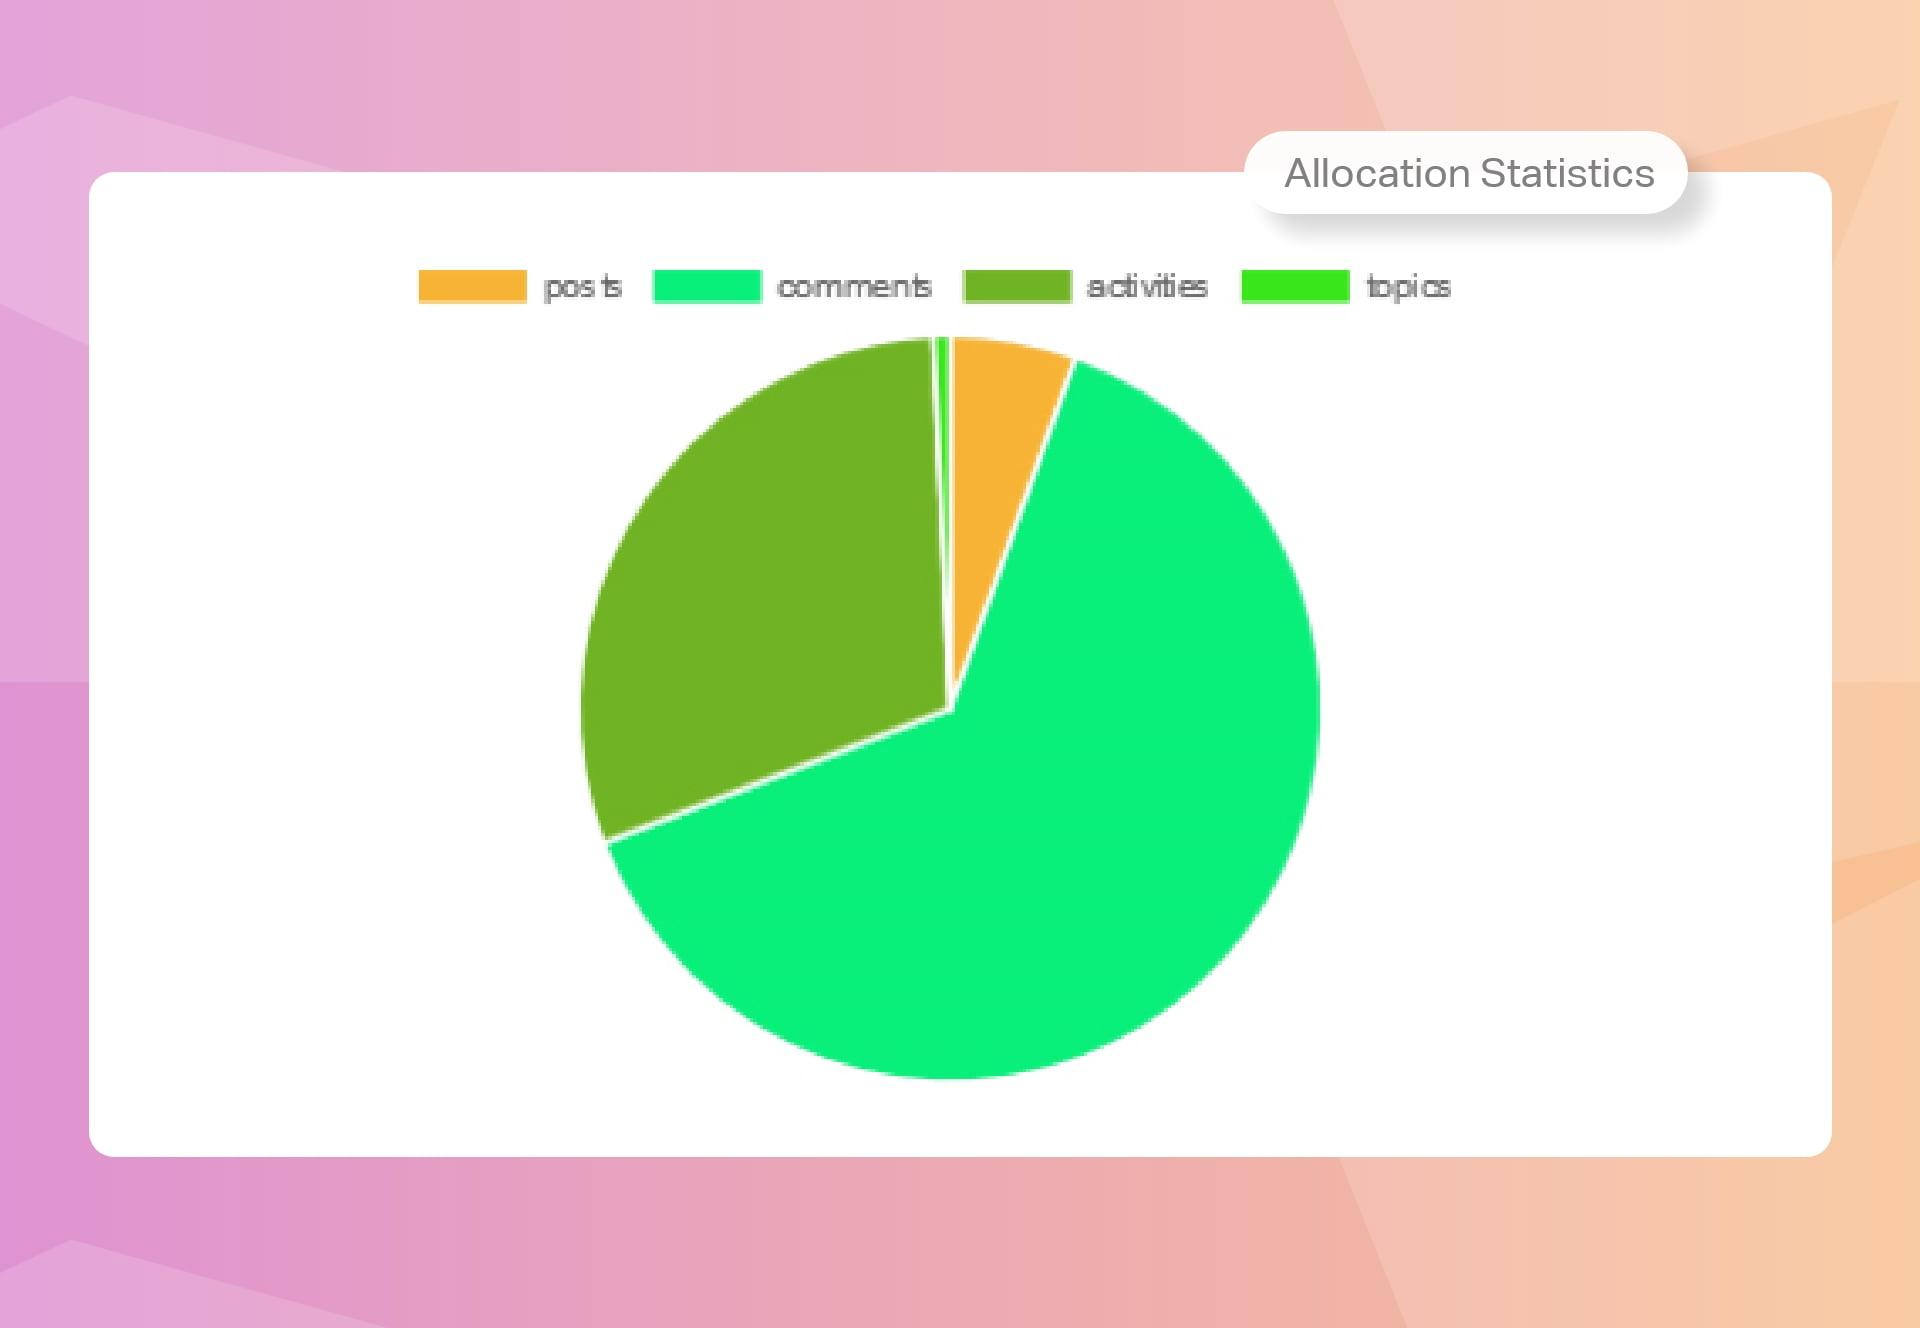 WP ULike Pro Statistics Tools - Allocation Statistics